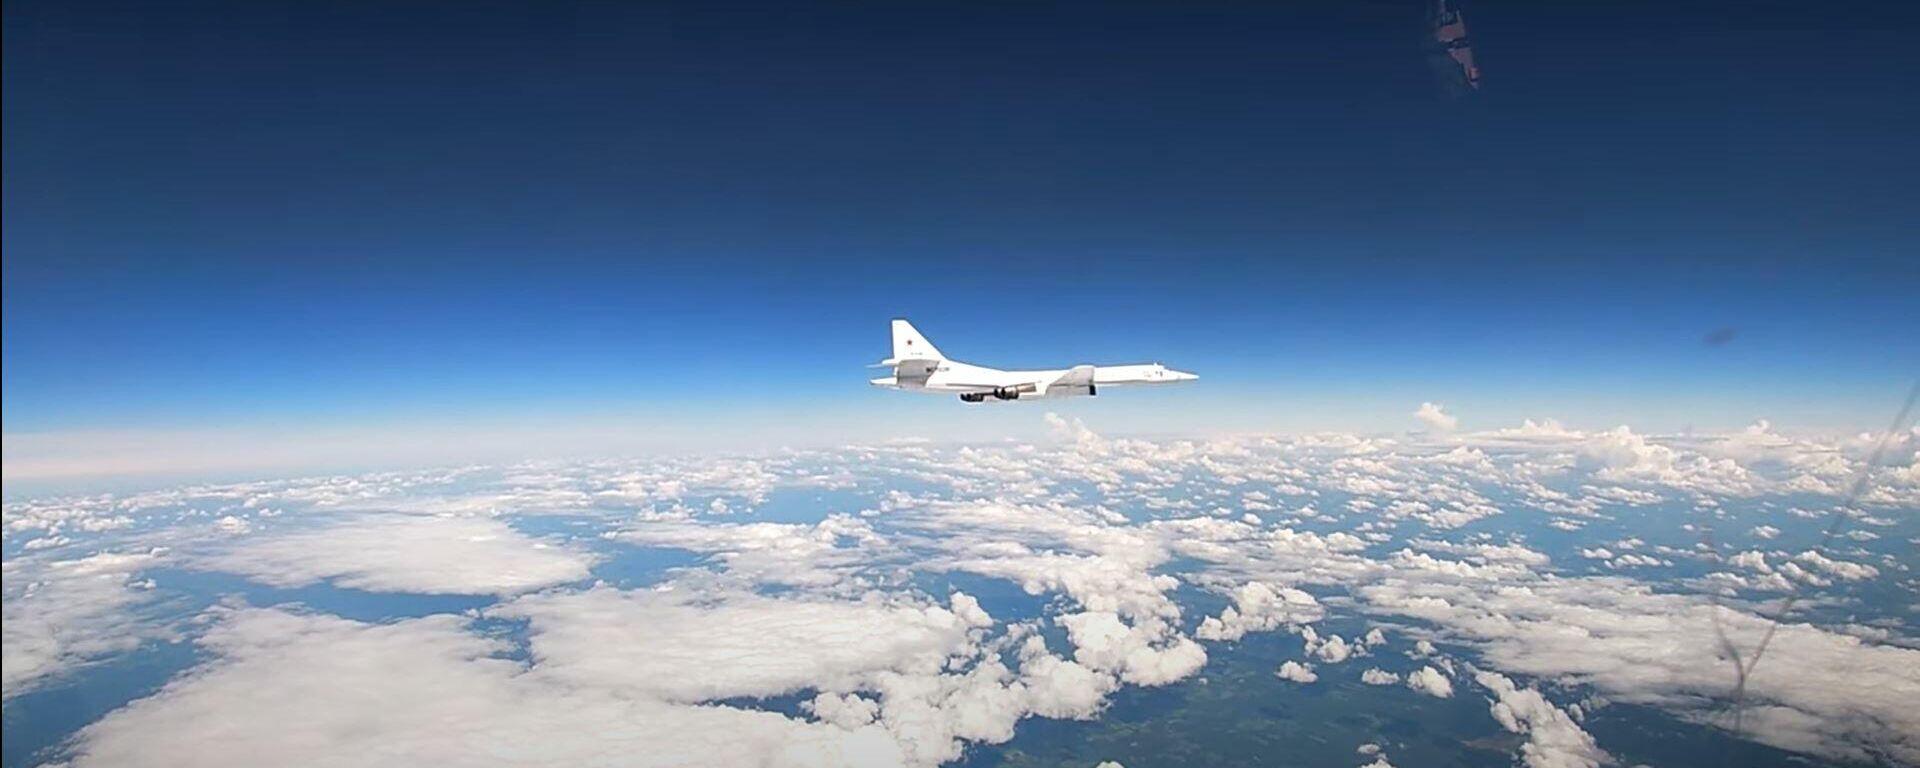 Опубликовано видео встречи над Балтикой ракетоносцев Ту-160 с истребителями НАТО - Sputnik Латвия, 1920, 17.06.2021